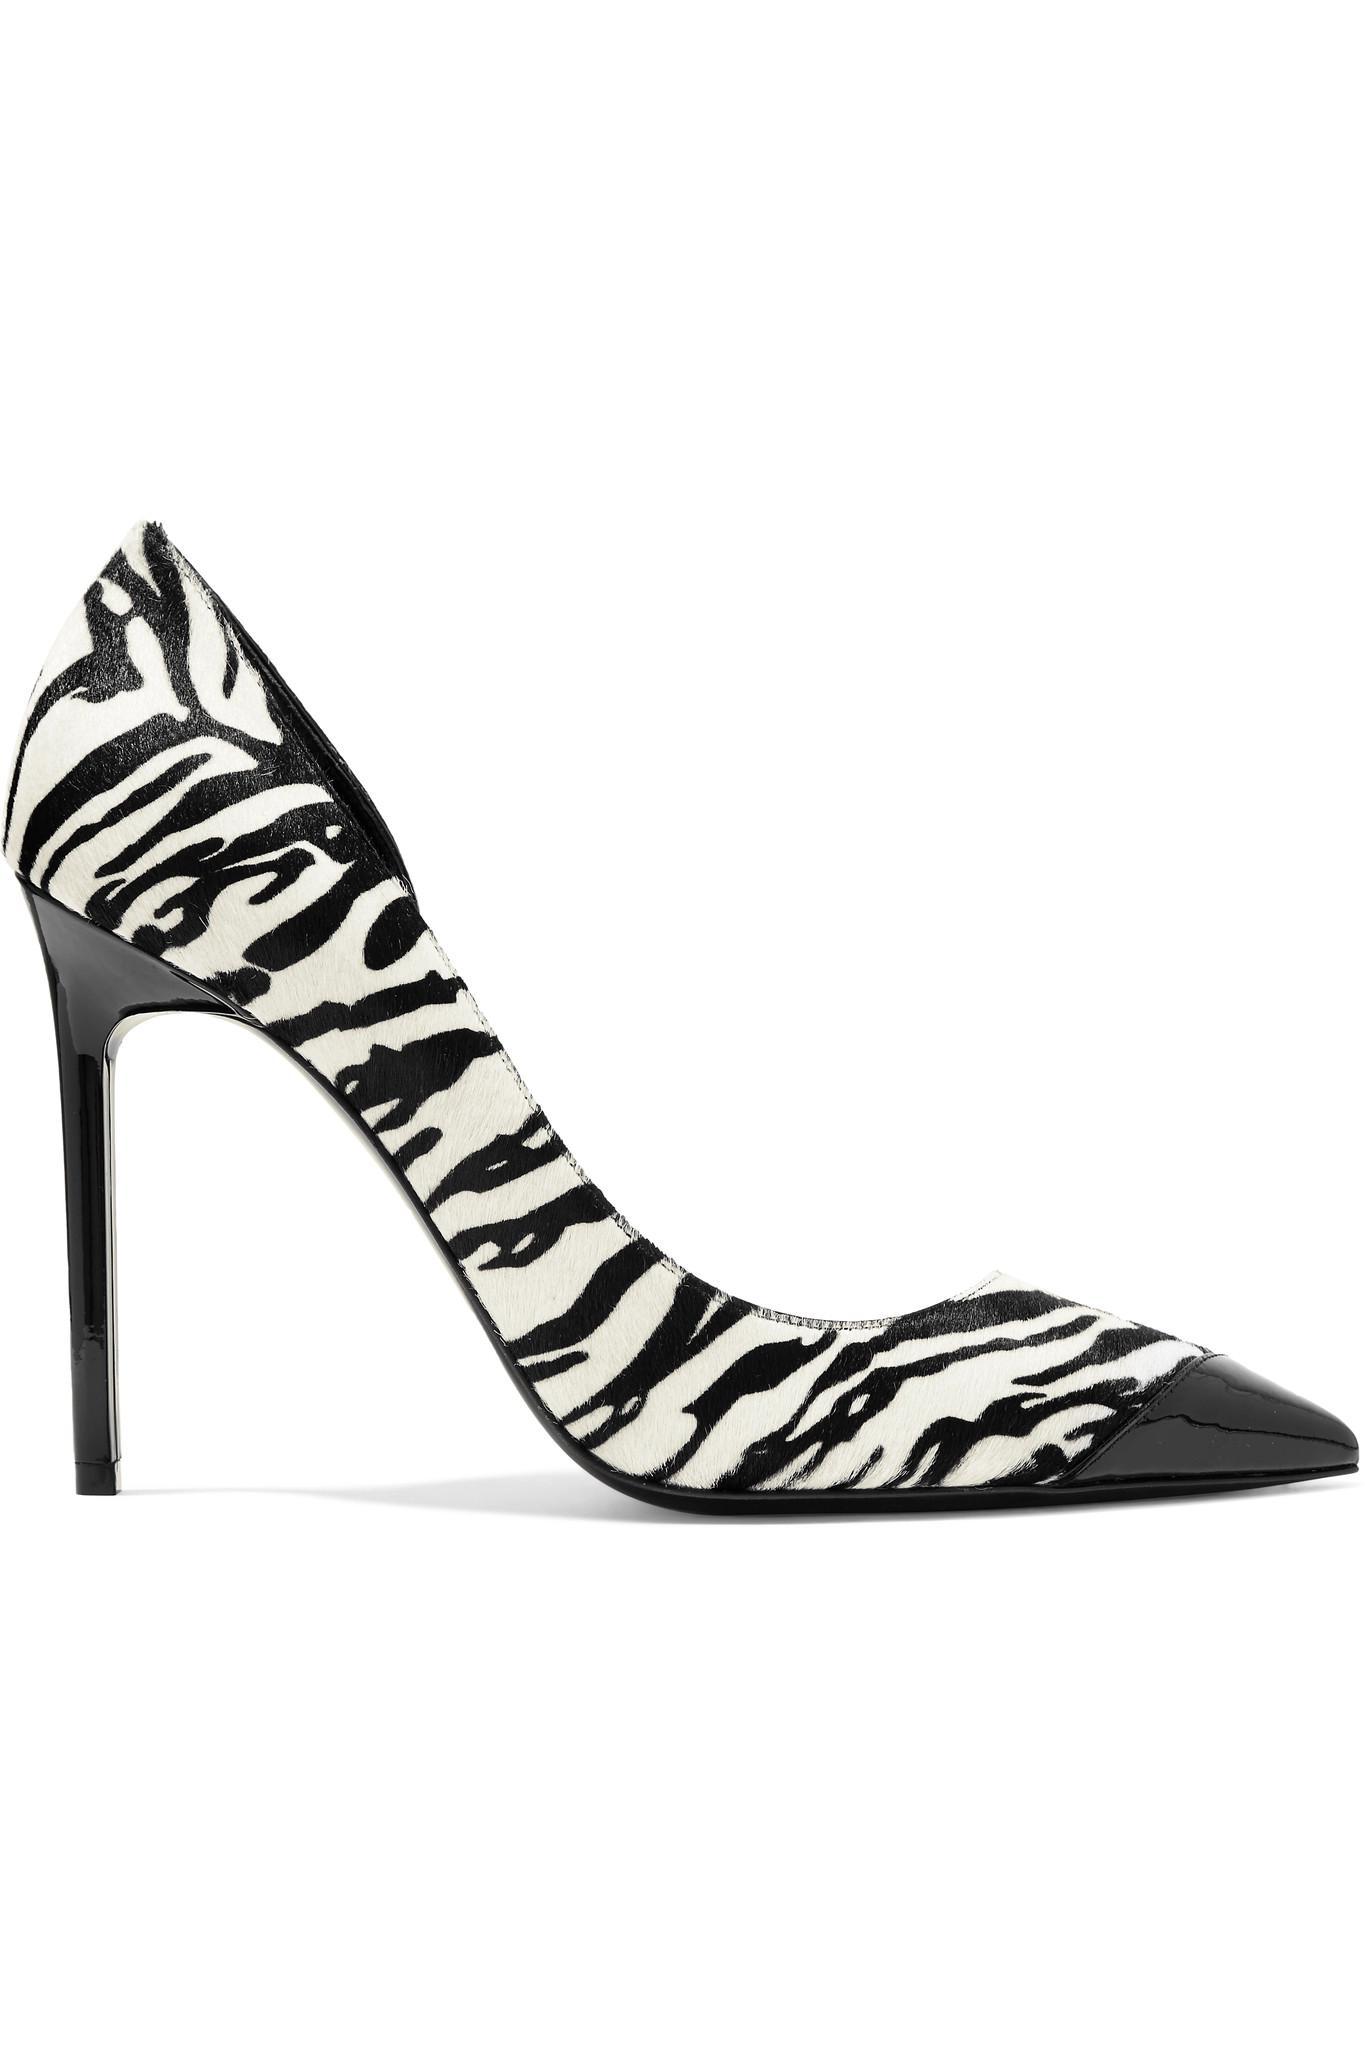 Saint Laurent Zebra Print Leather Heels wGVhAP